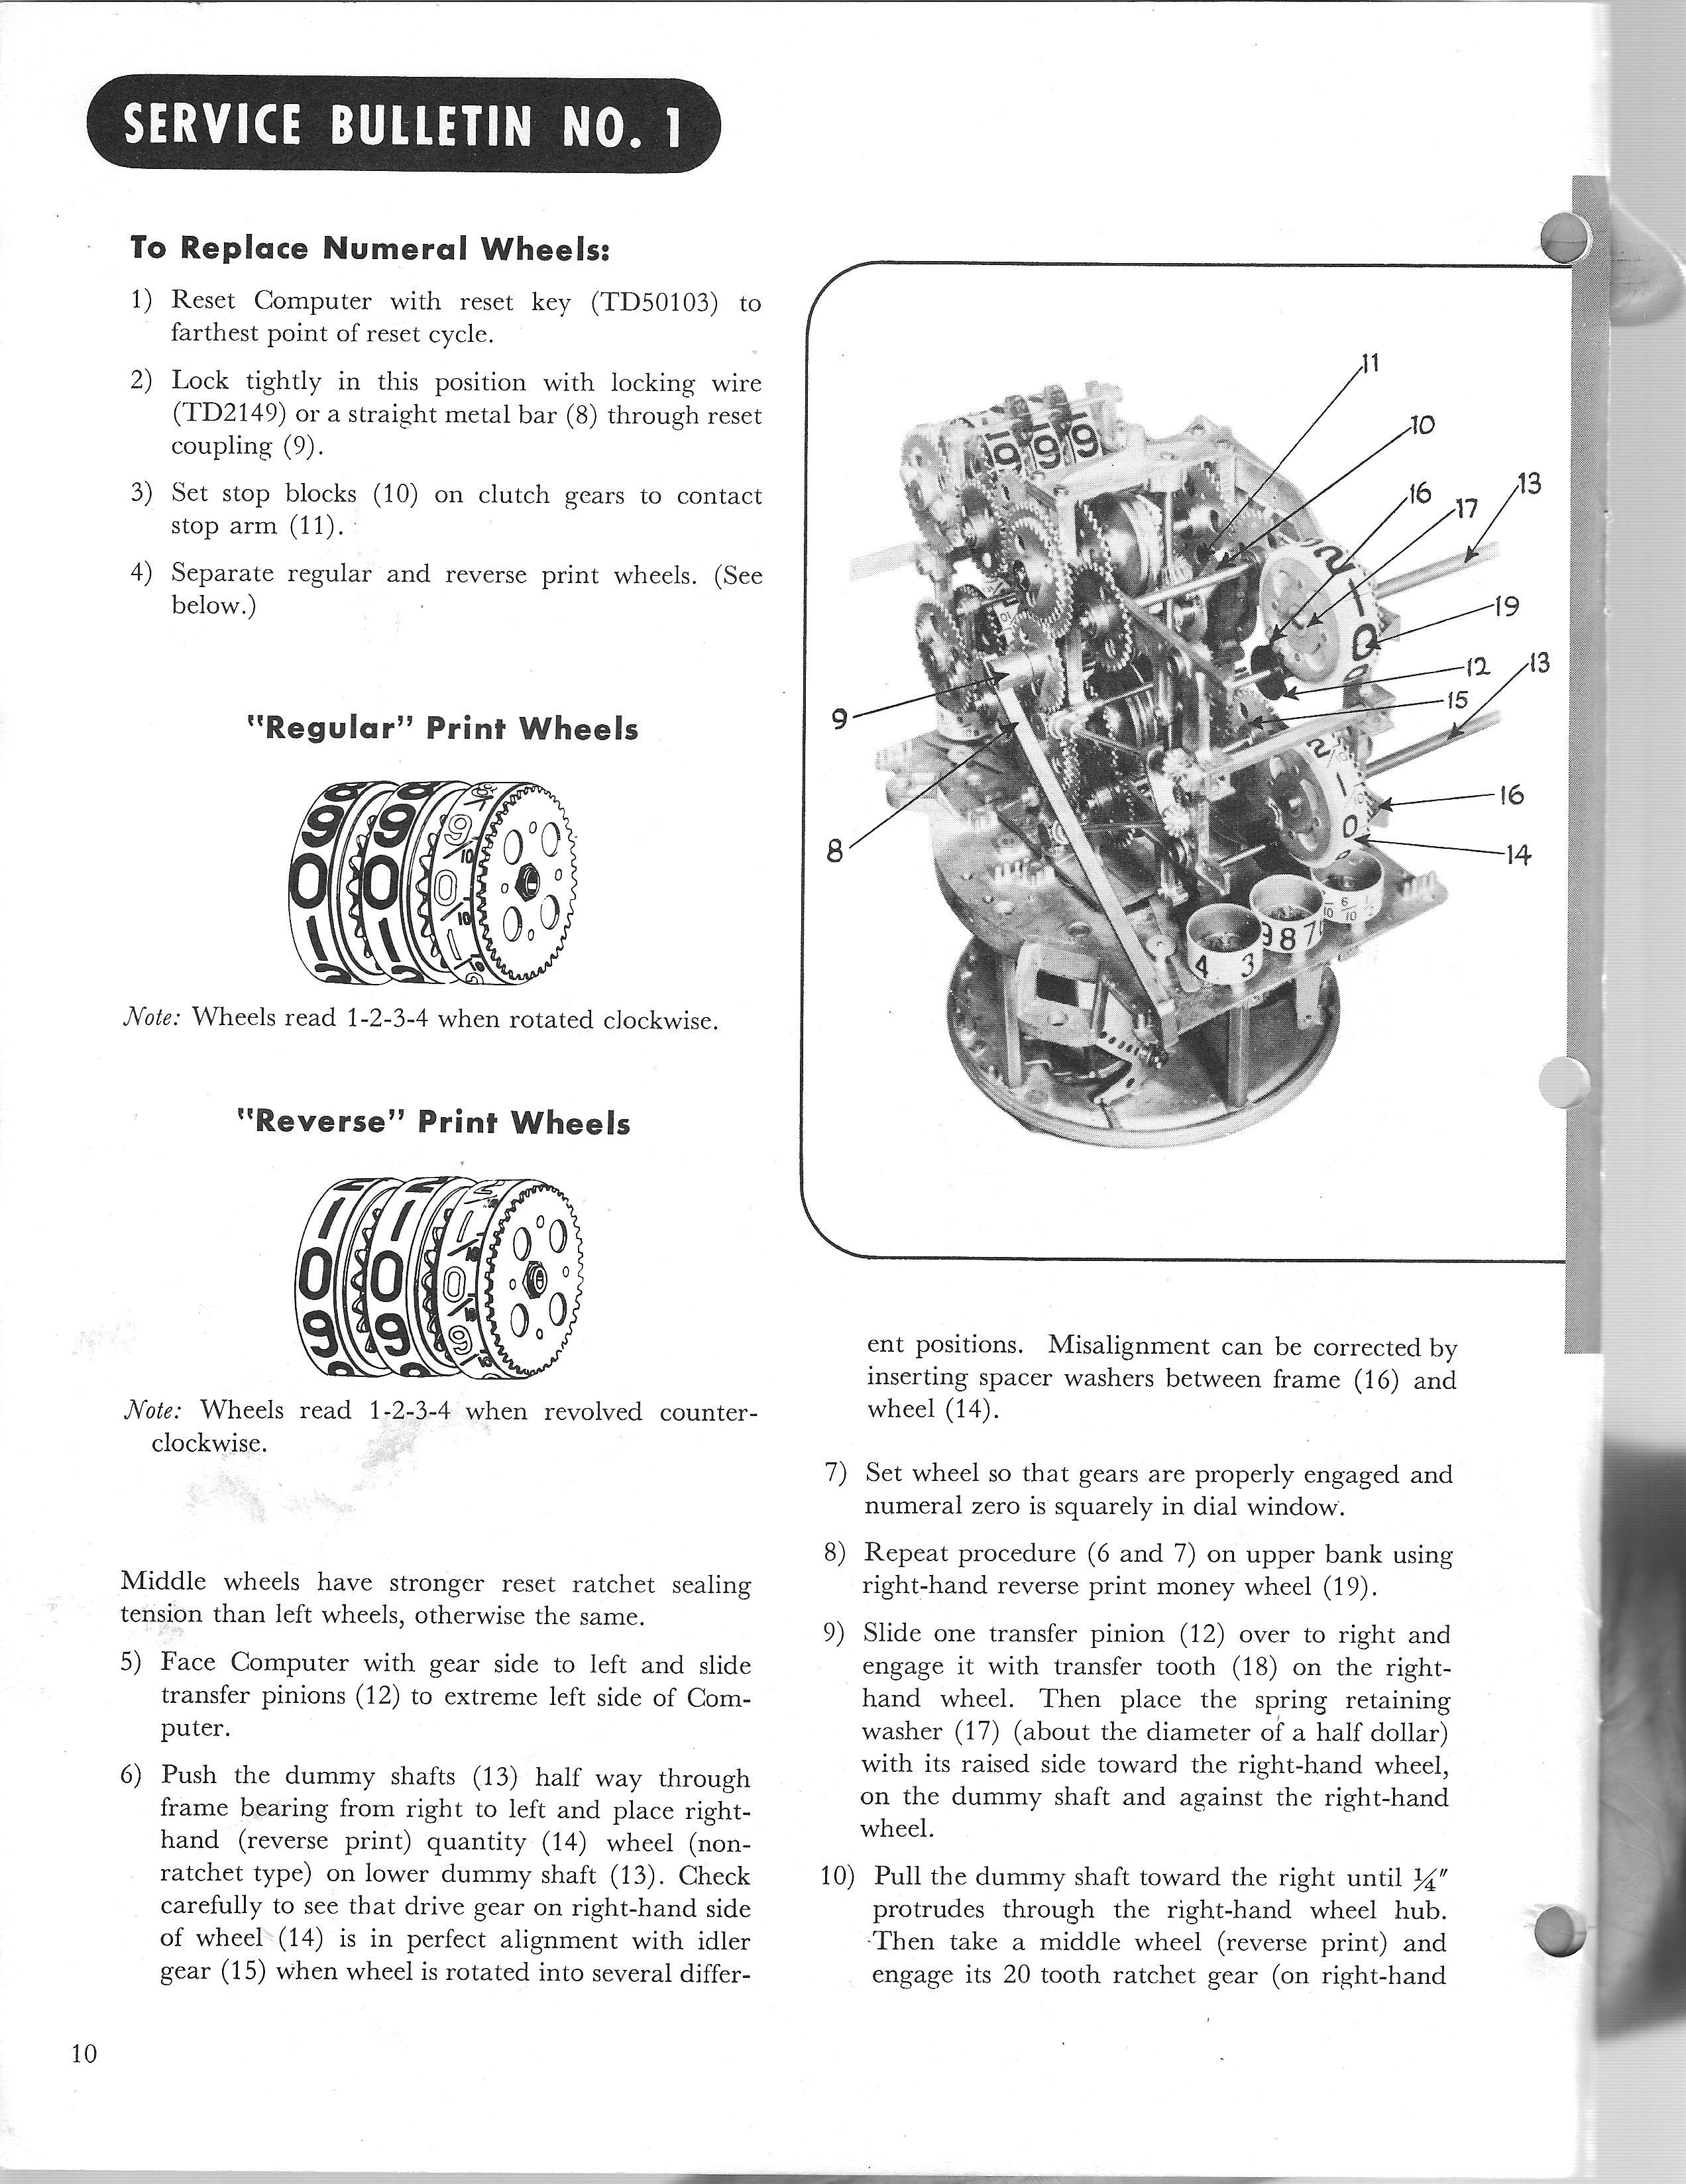 ... Veeder Root Manual ...